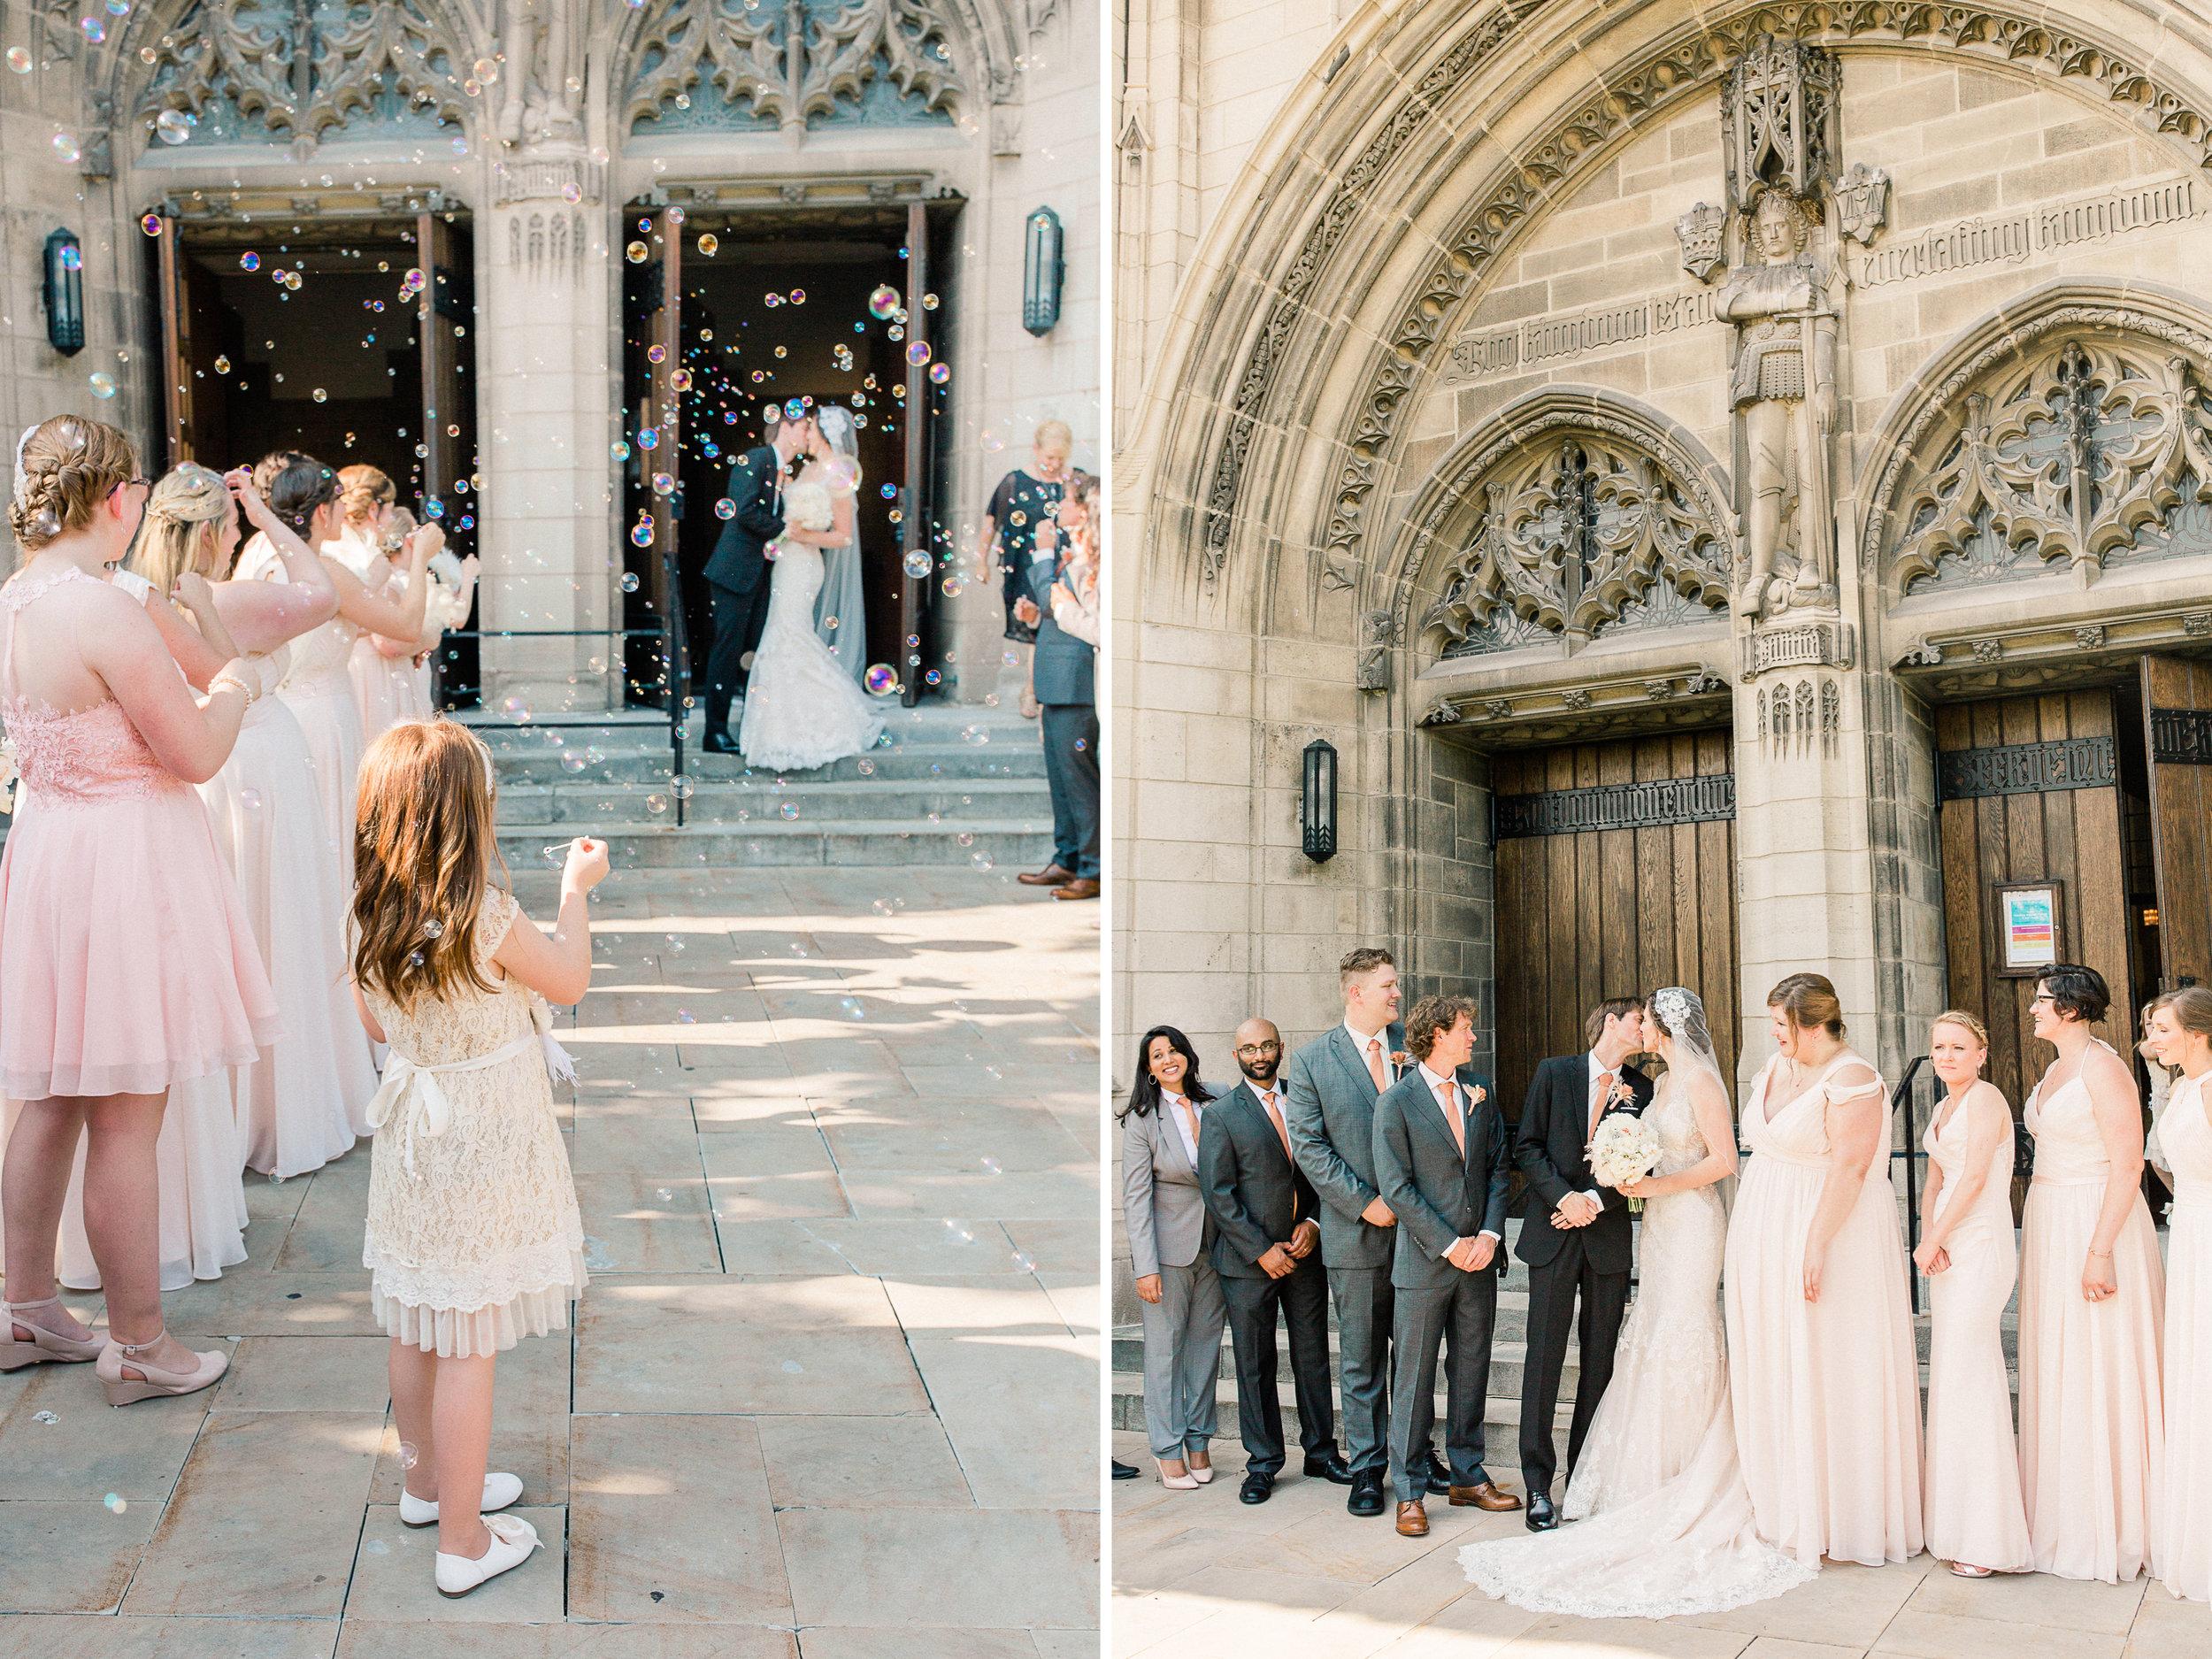 Dorothy_Louise_Photography_University_of_Chicago_Wedding8.jpg